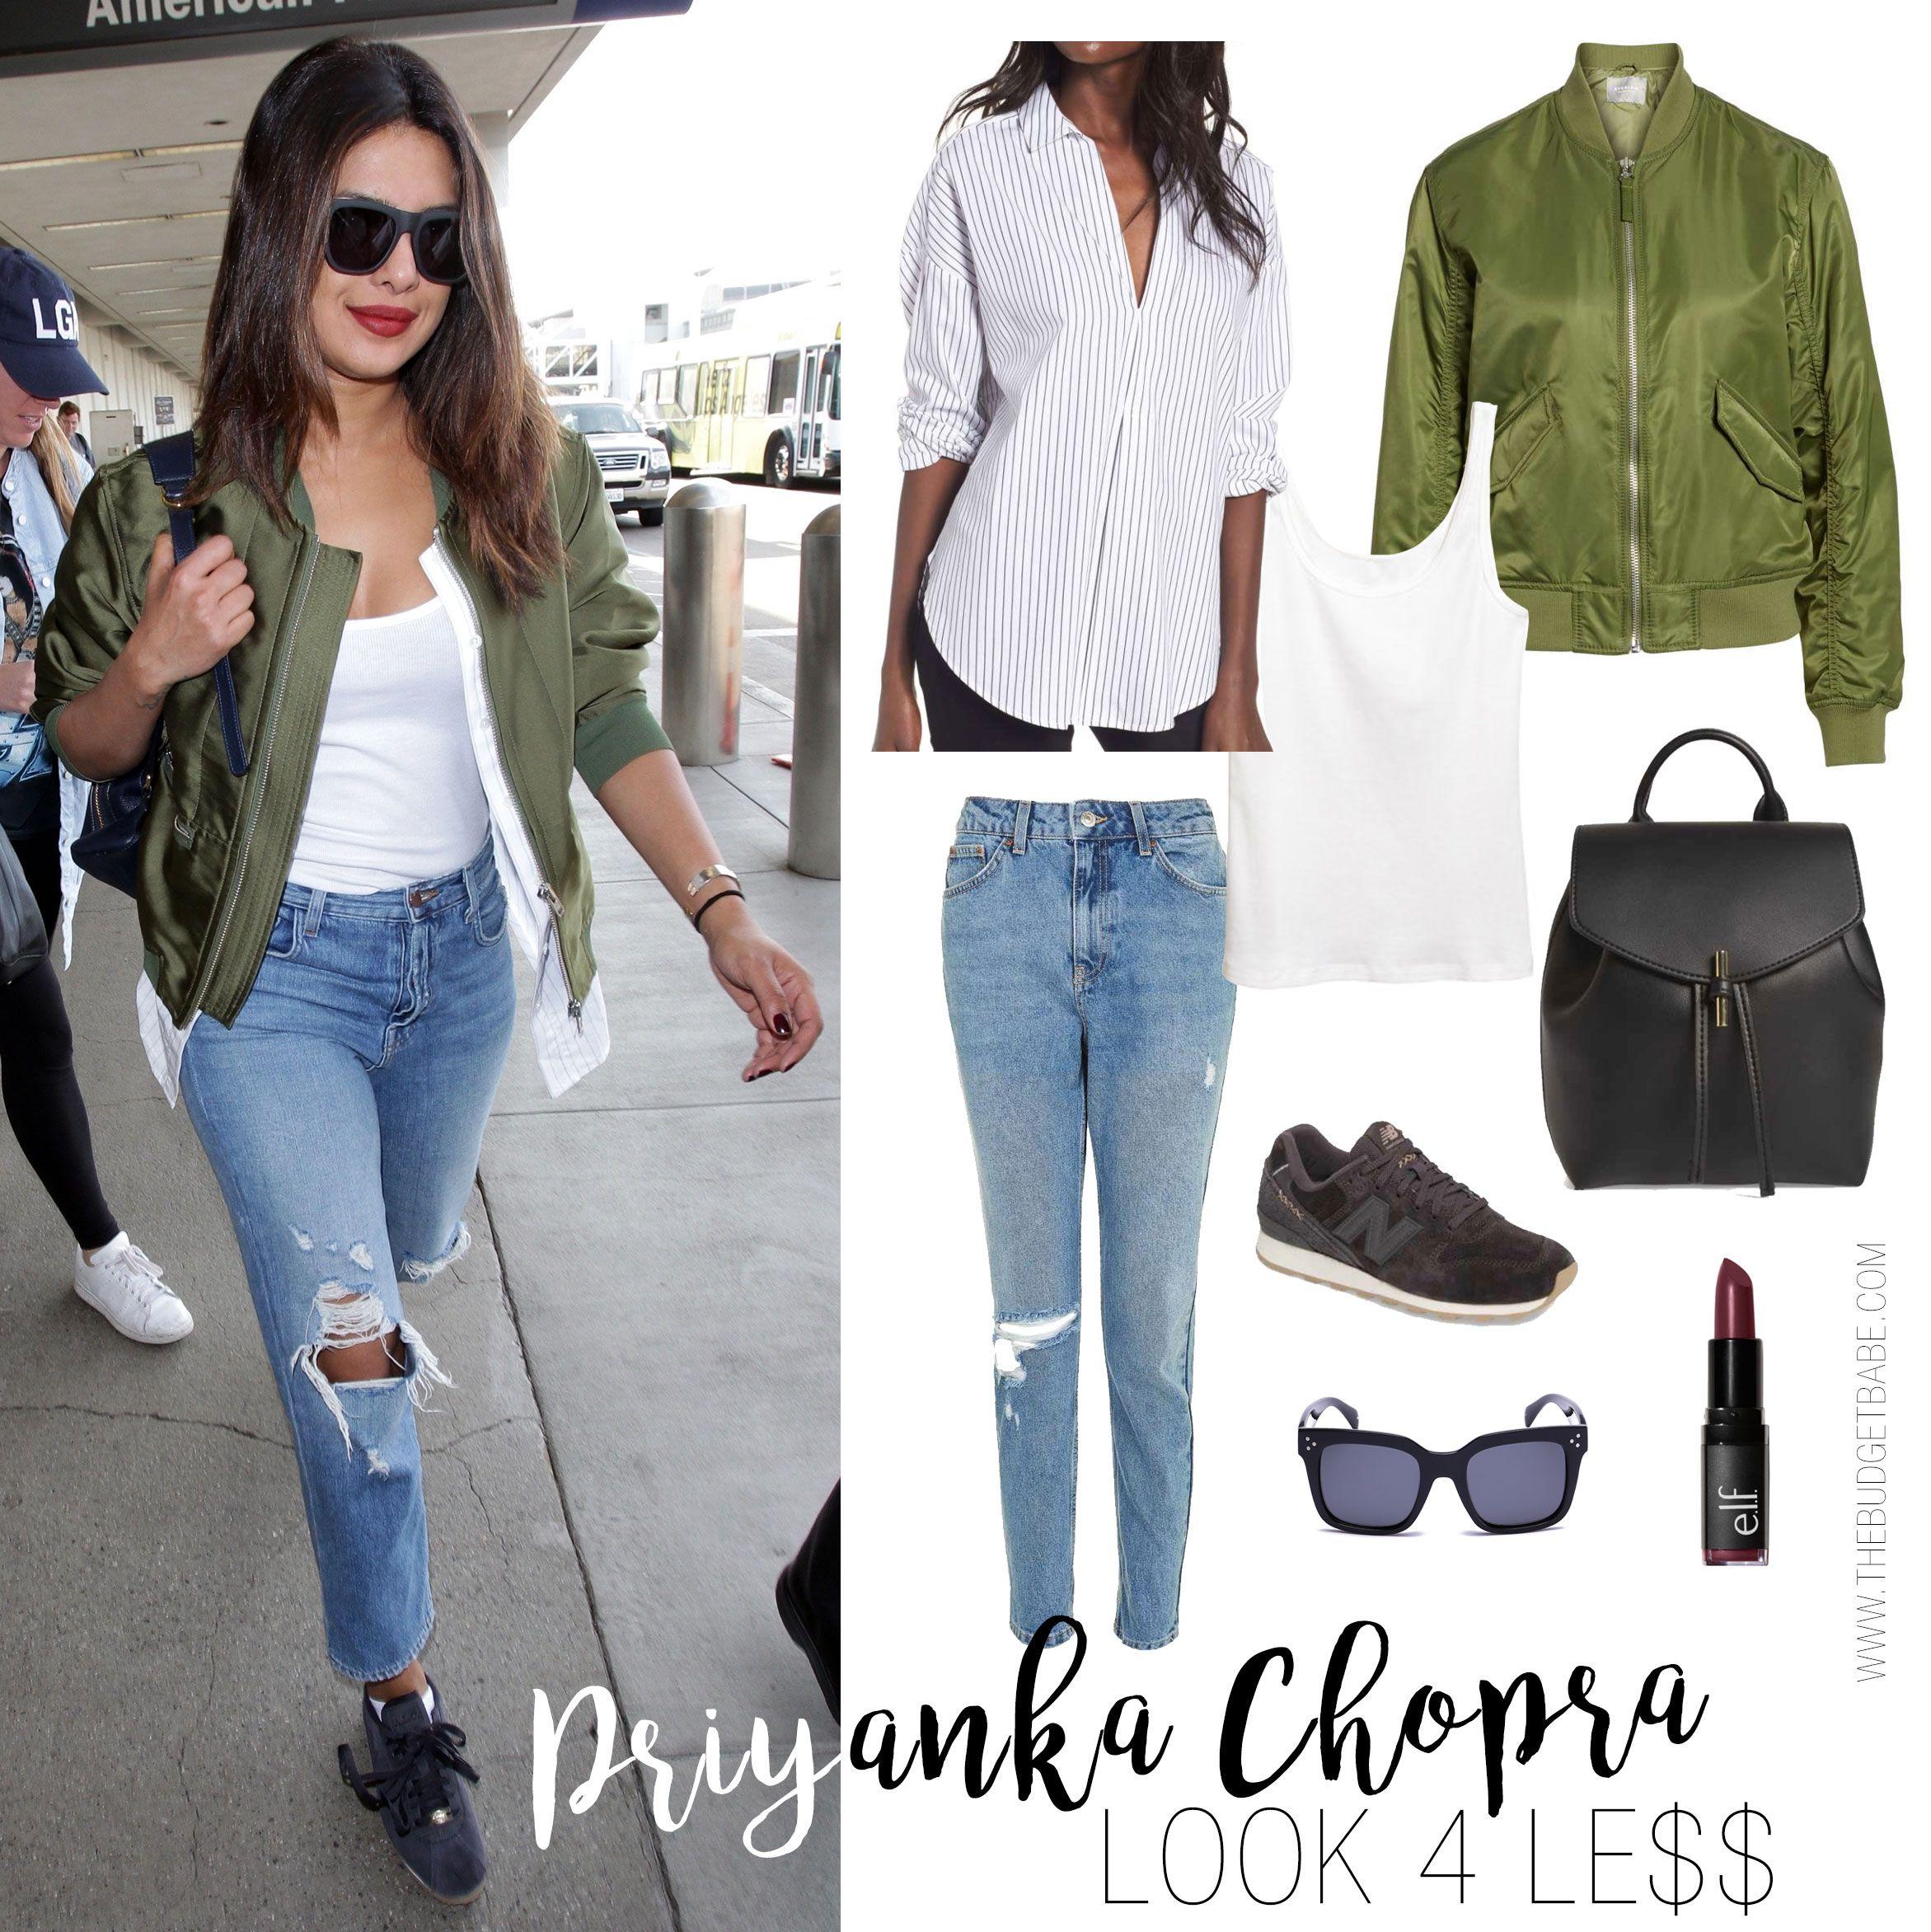 Priyanka Chopra's Olive Bomber Jacket and Suede Sneakers